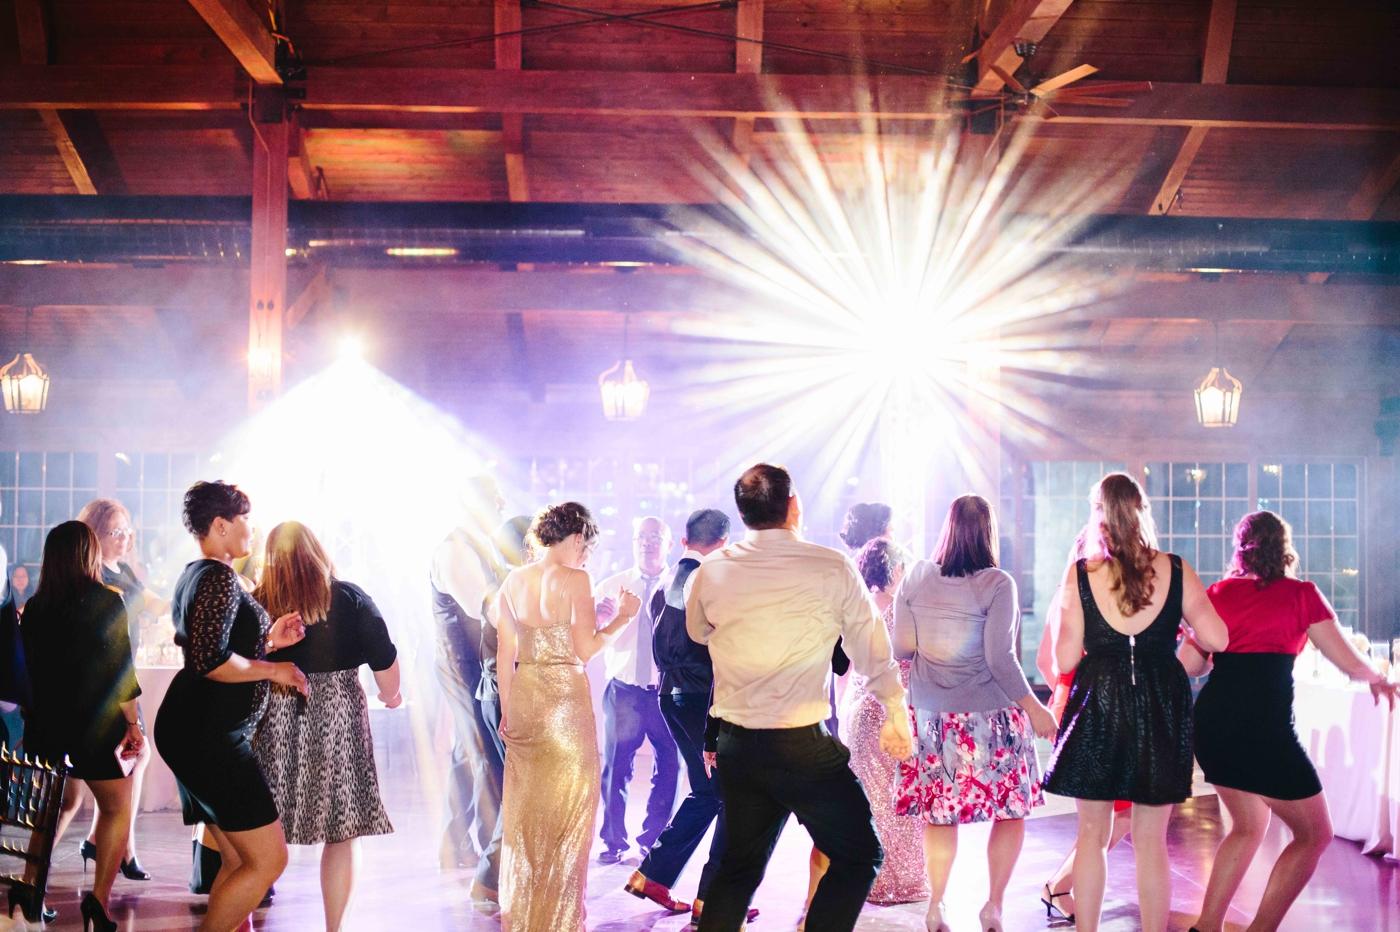 chicago-fine-art-wedding-photography-vo41